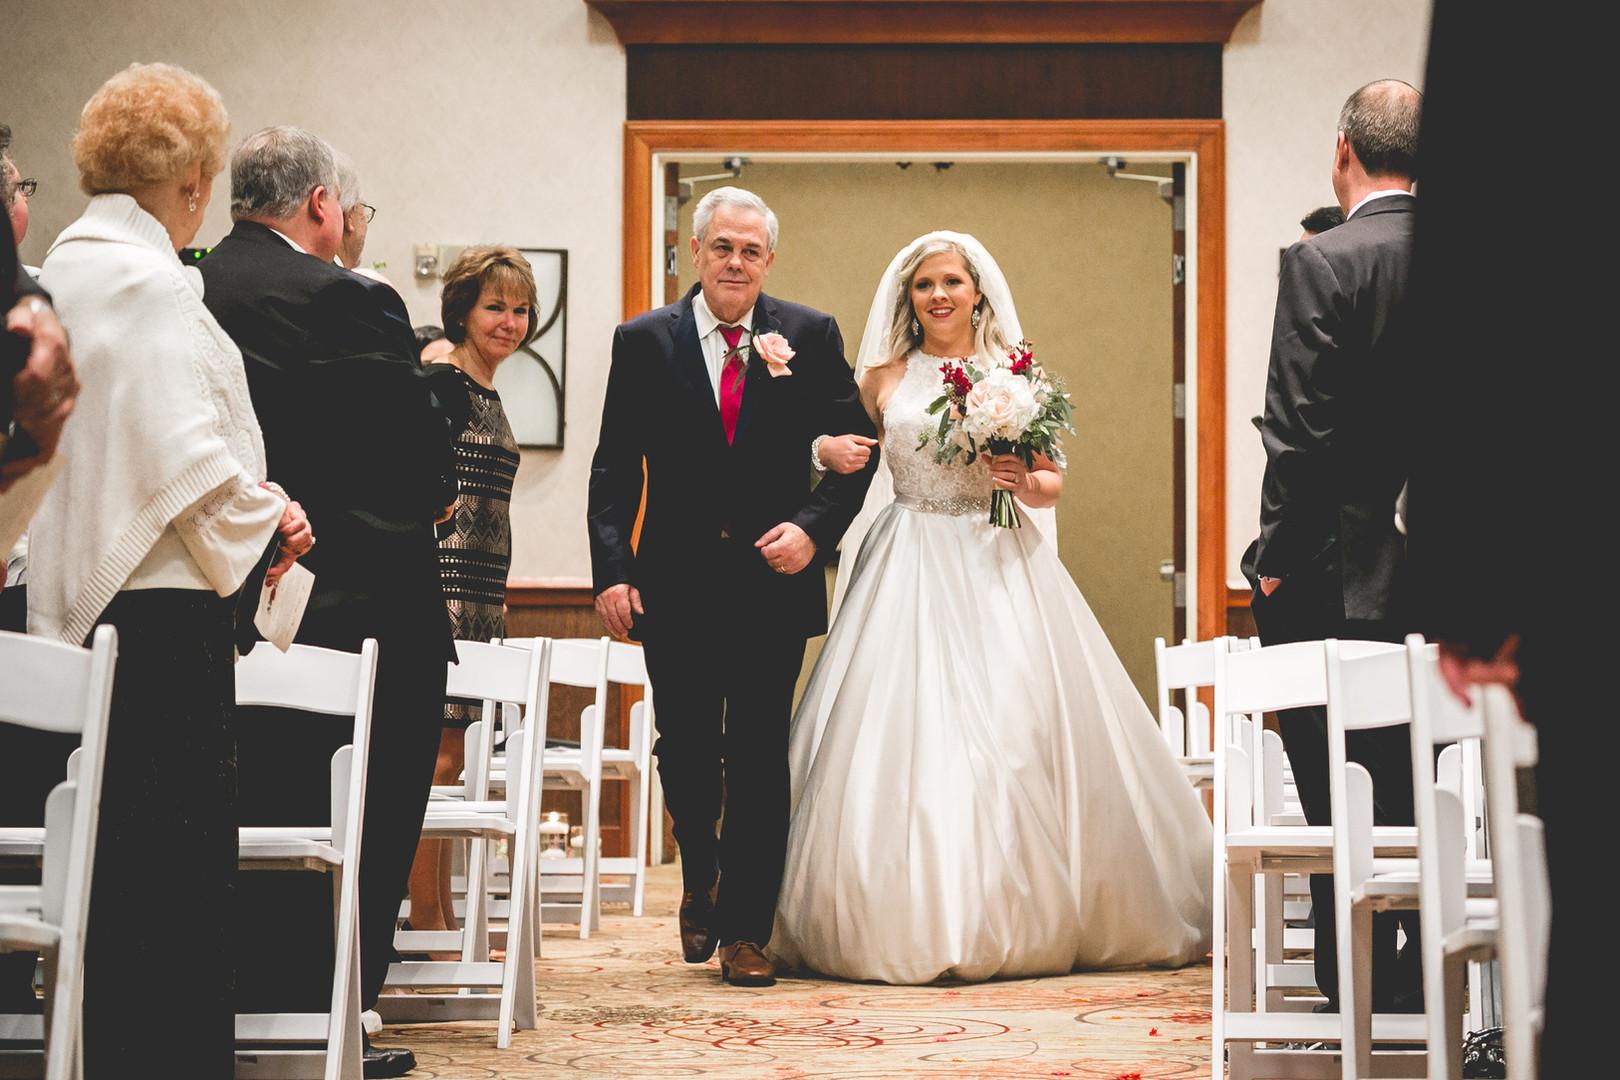 wedding-photo-bride-groom-106.jpg